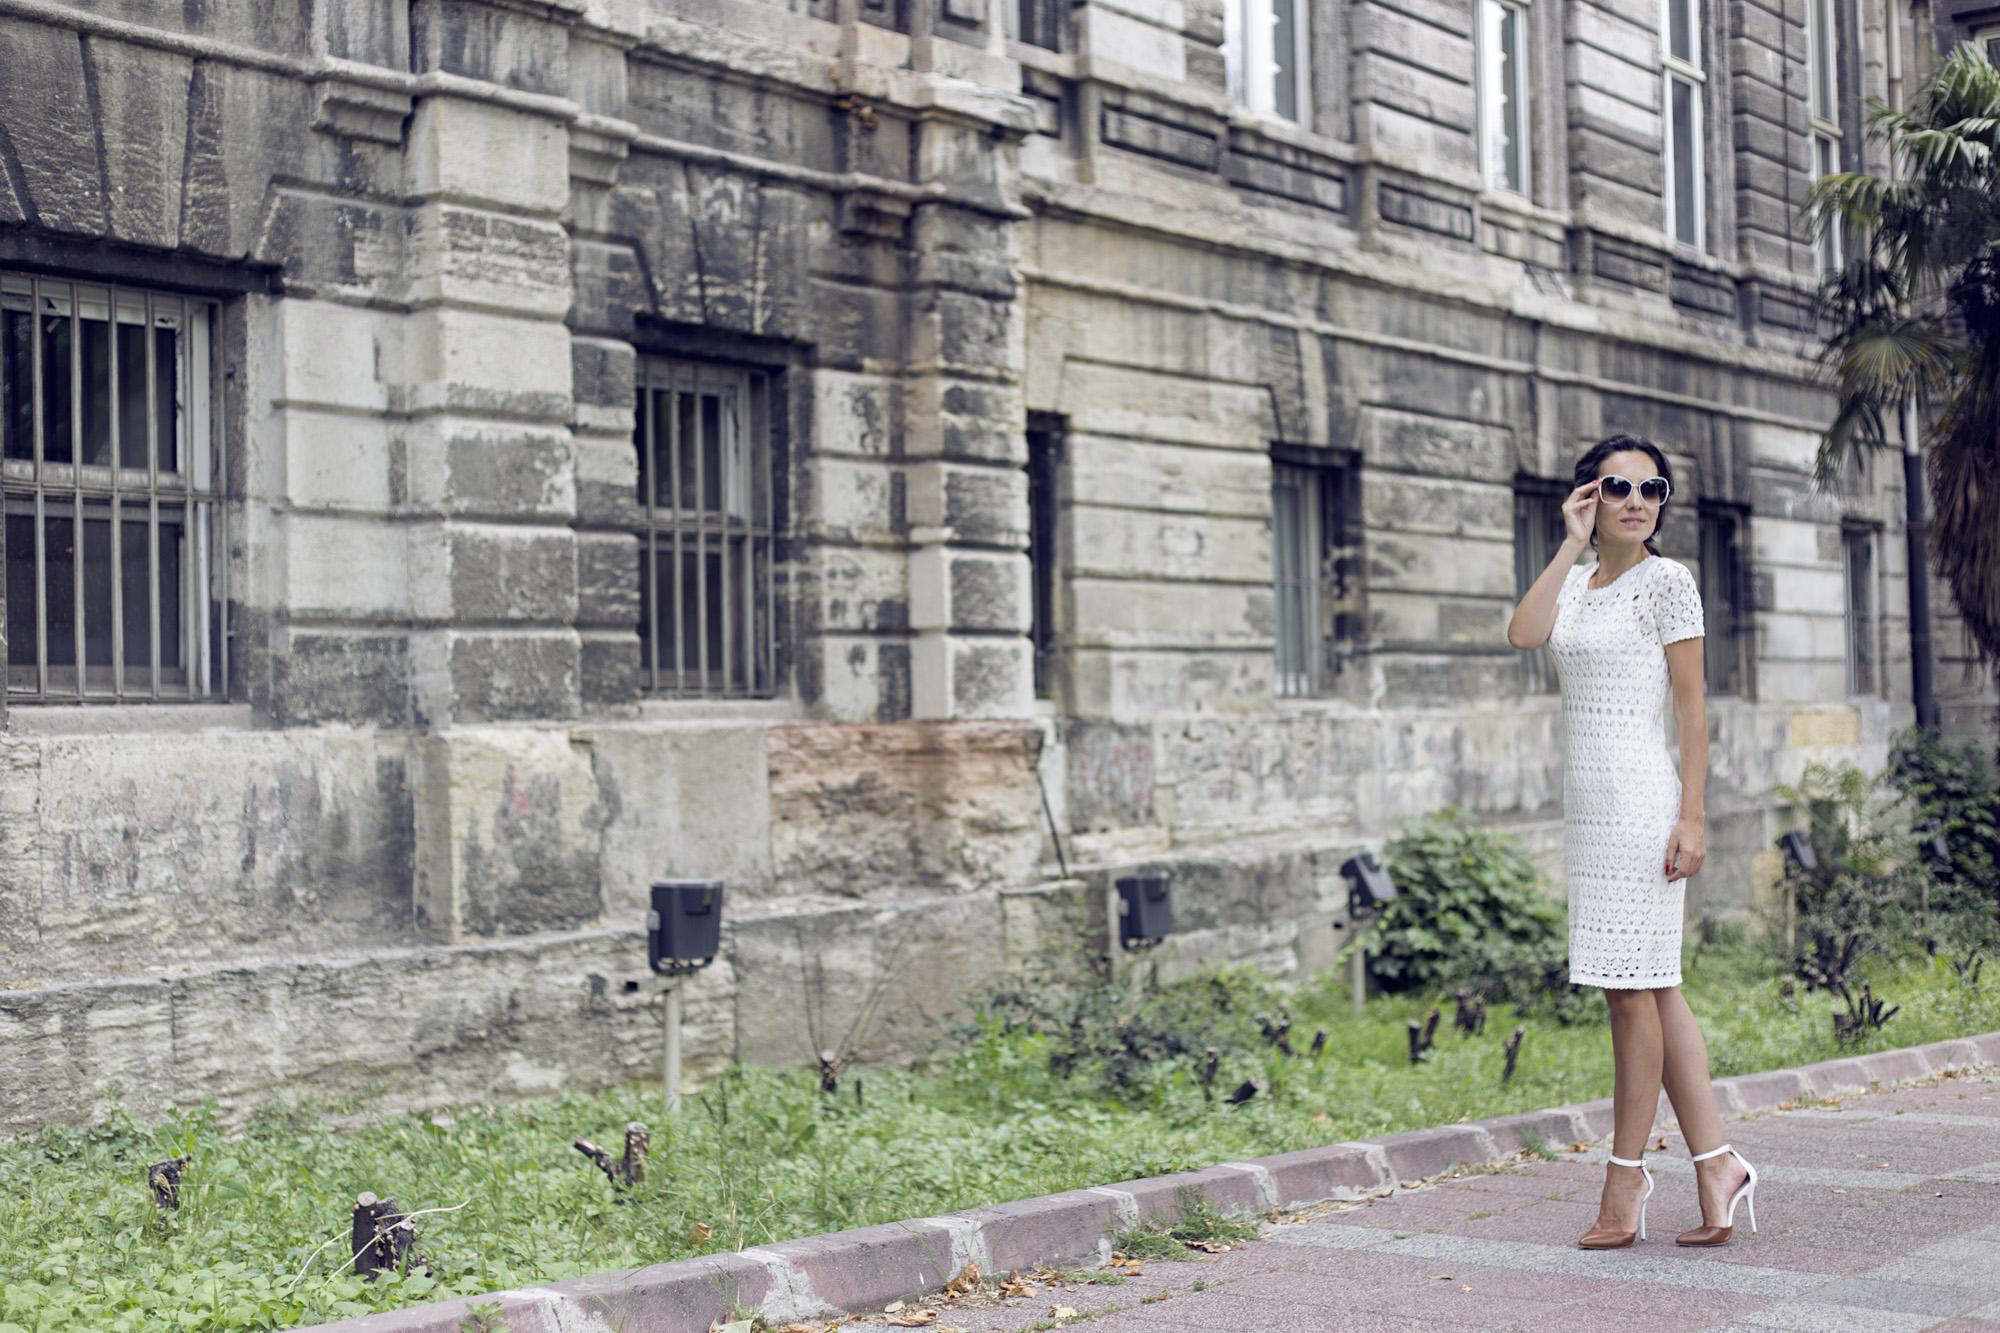 stefanel, örme elbise modelleri, makrame, makrame elbise, beyaz örgü elbise, turkuaz optik, tom ford güneş gözlüğü modelleri, tom ford, güneş gözlüğü, beyaz güneş gözlüğü modelleri